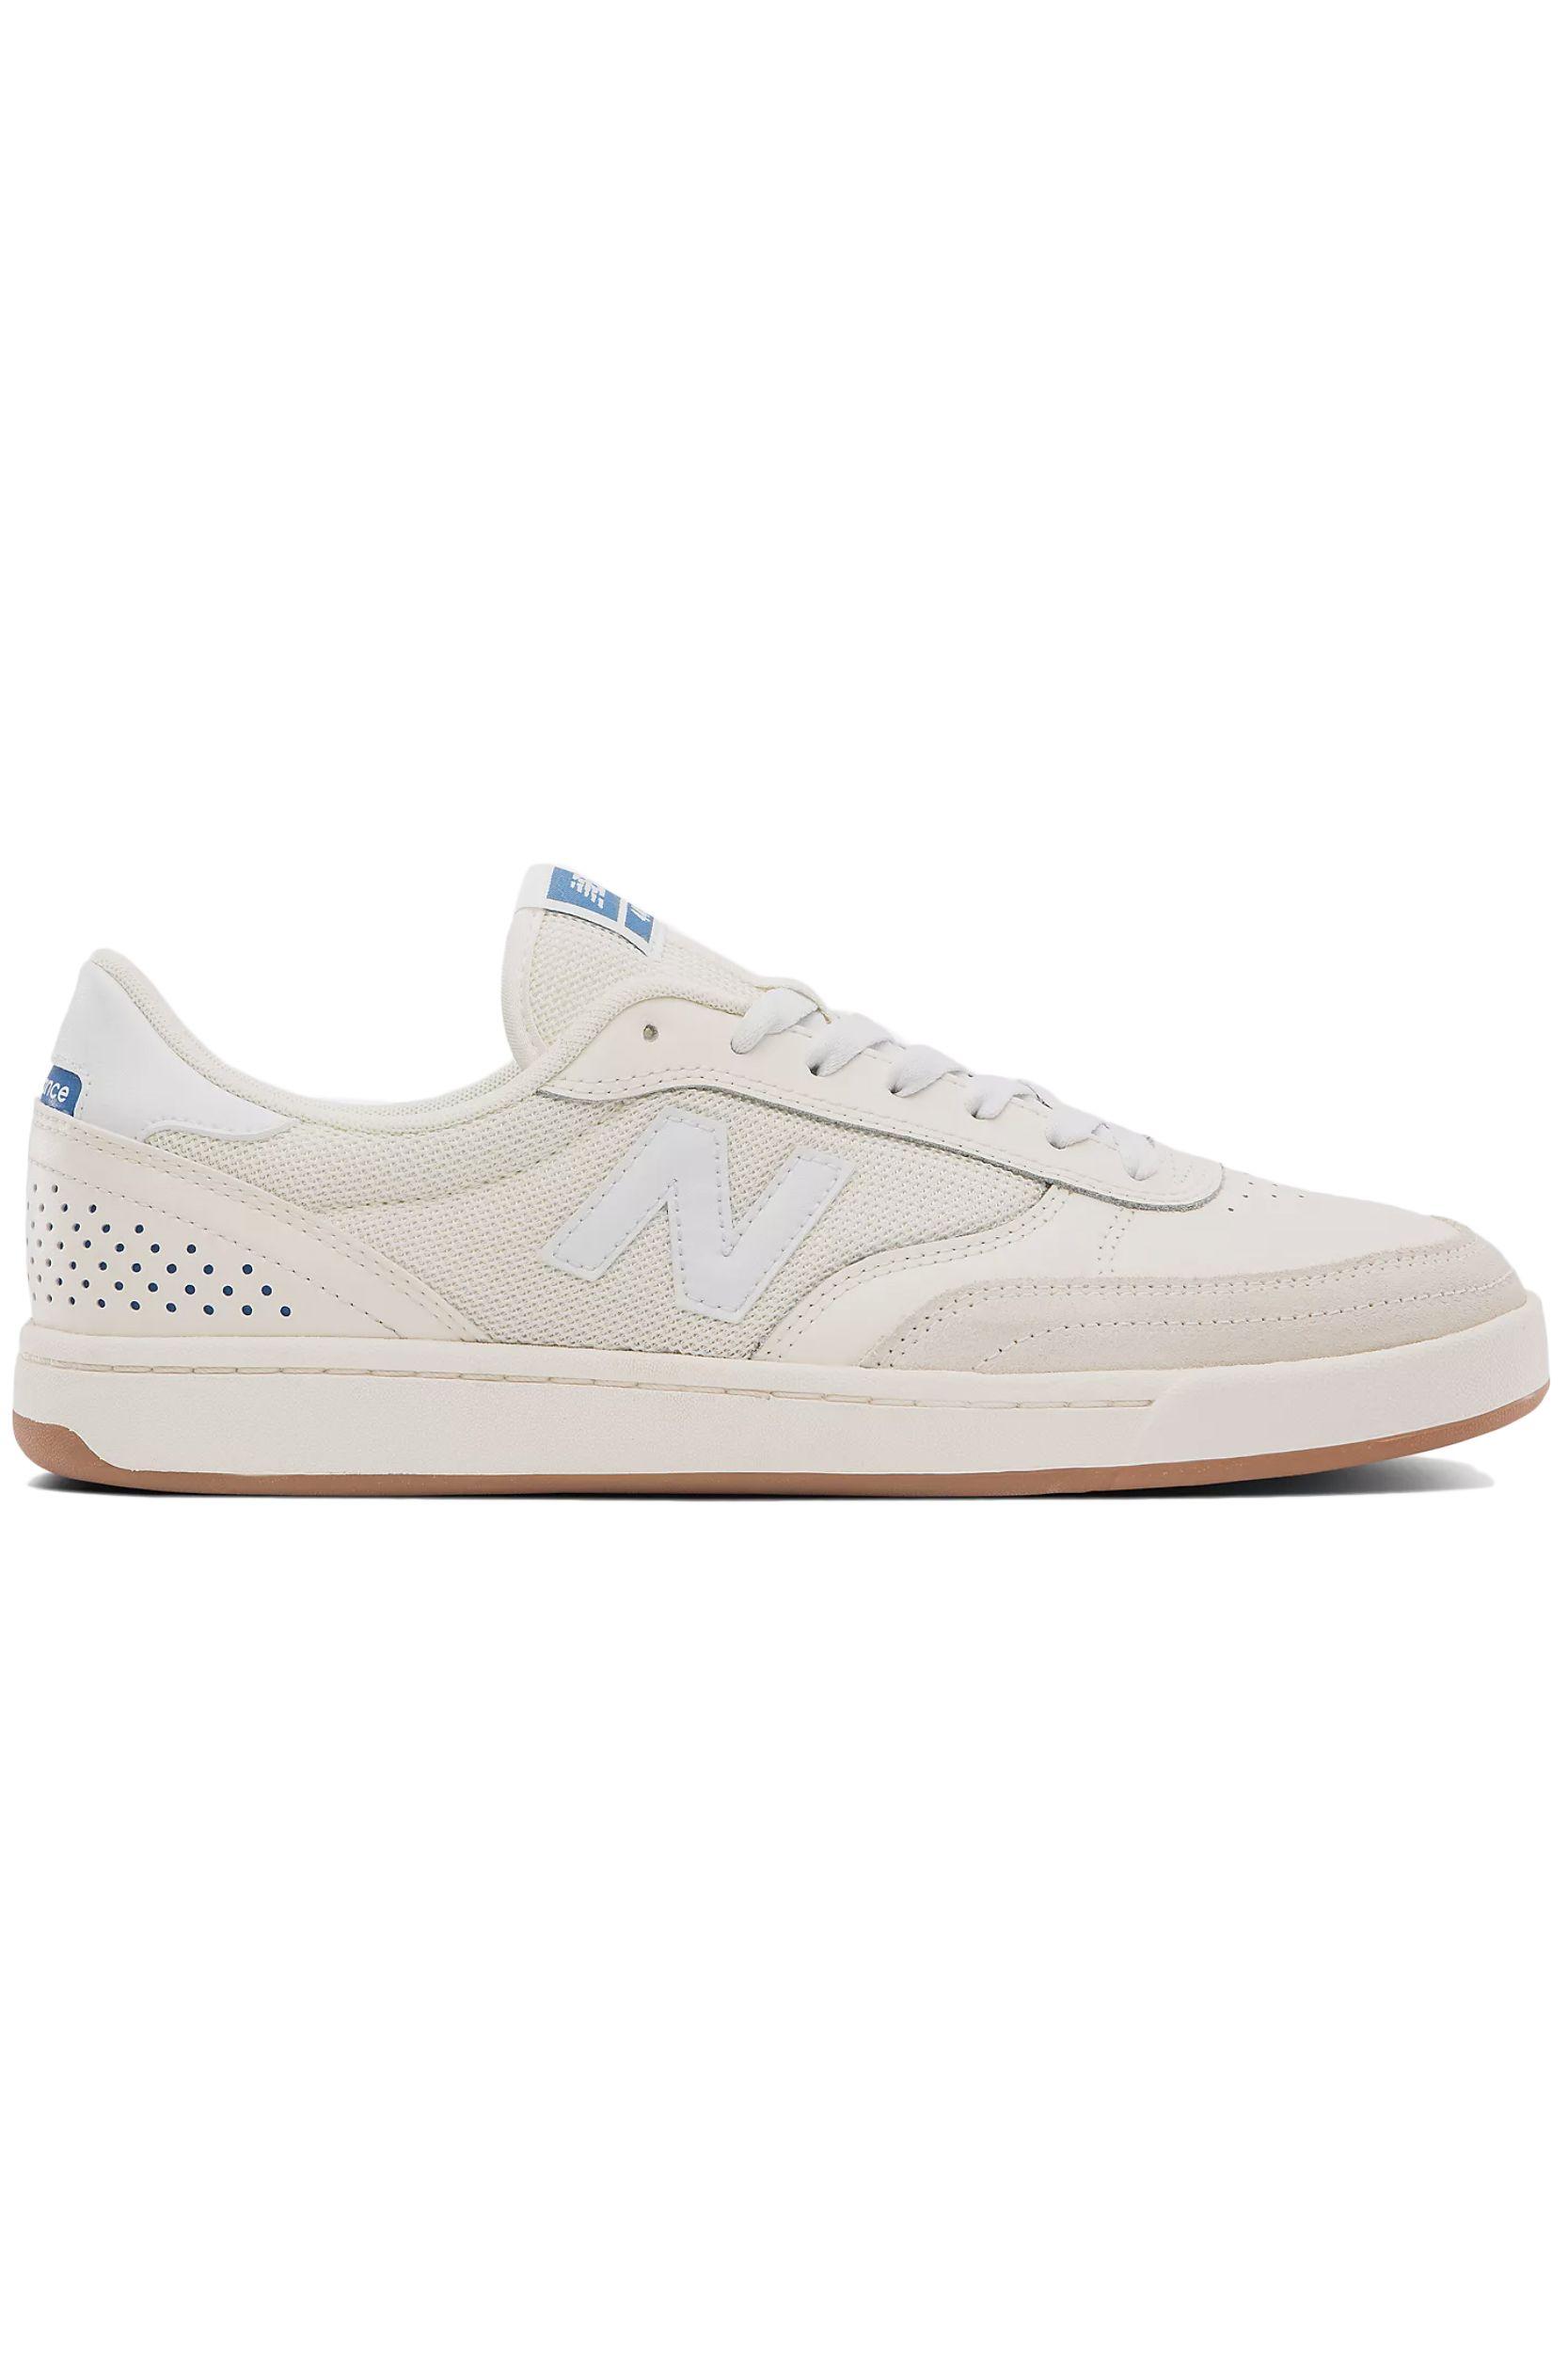 New Balance Shoes NM440 White